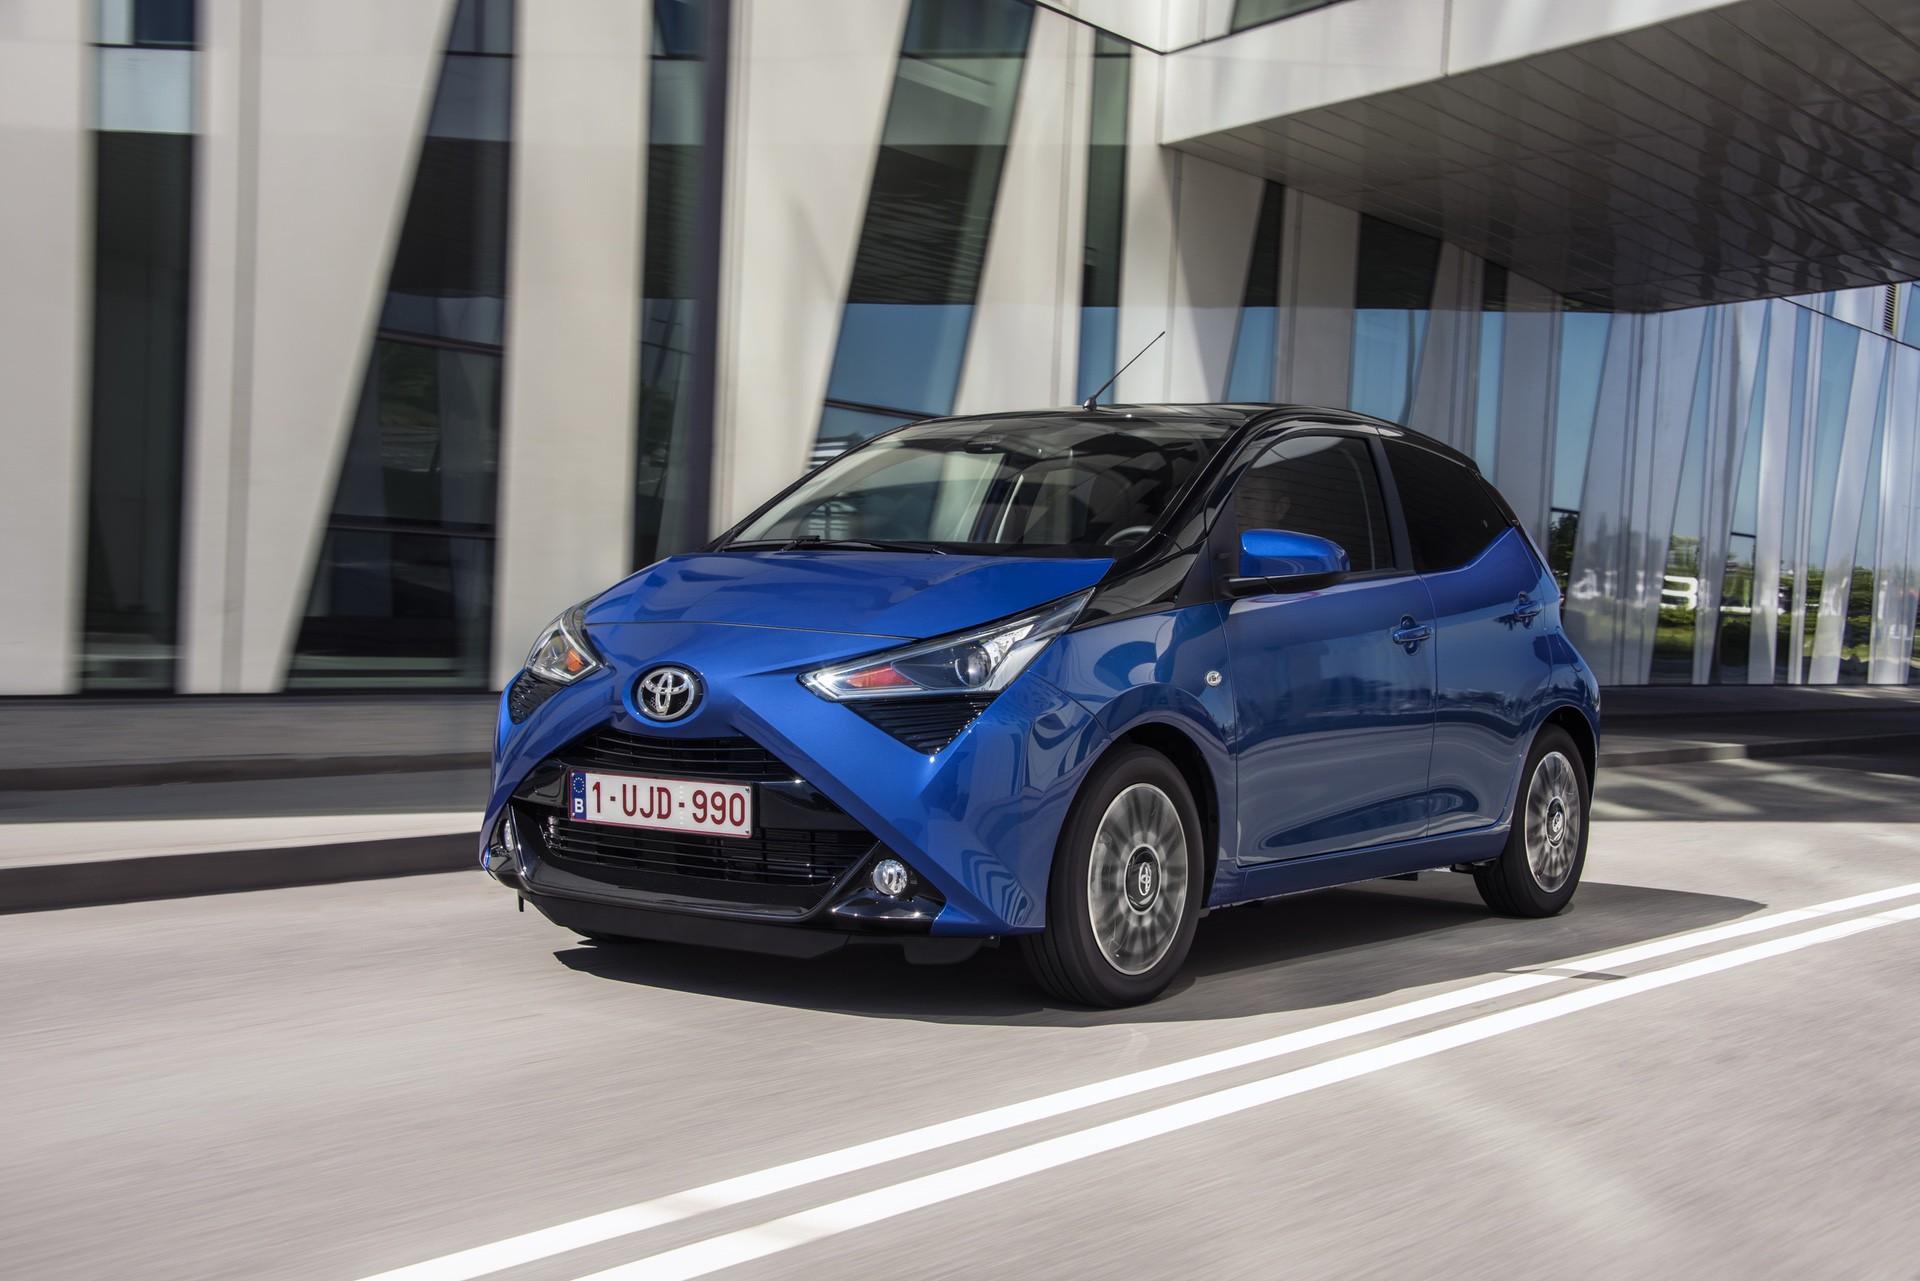 Toyota_Aygo_facelift_presskit_0021